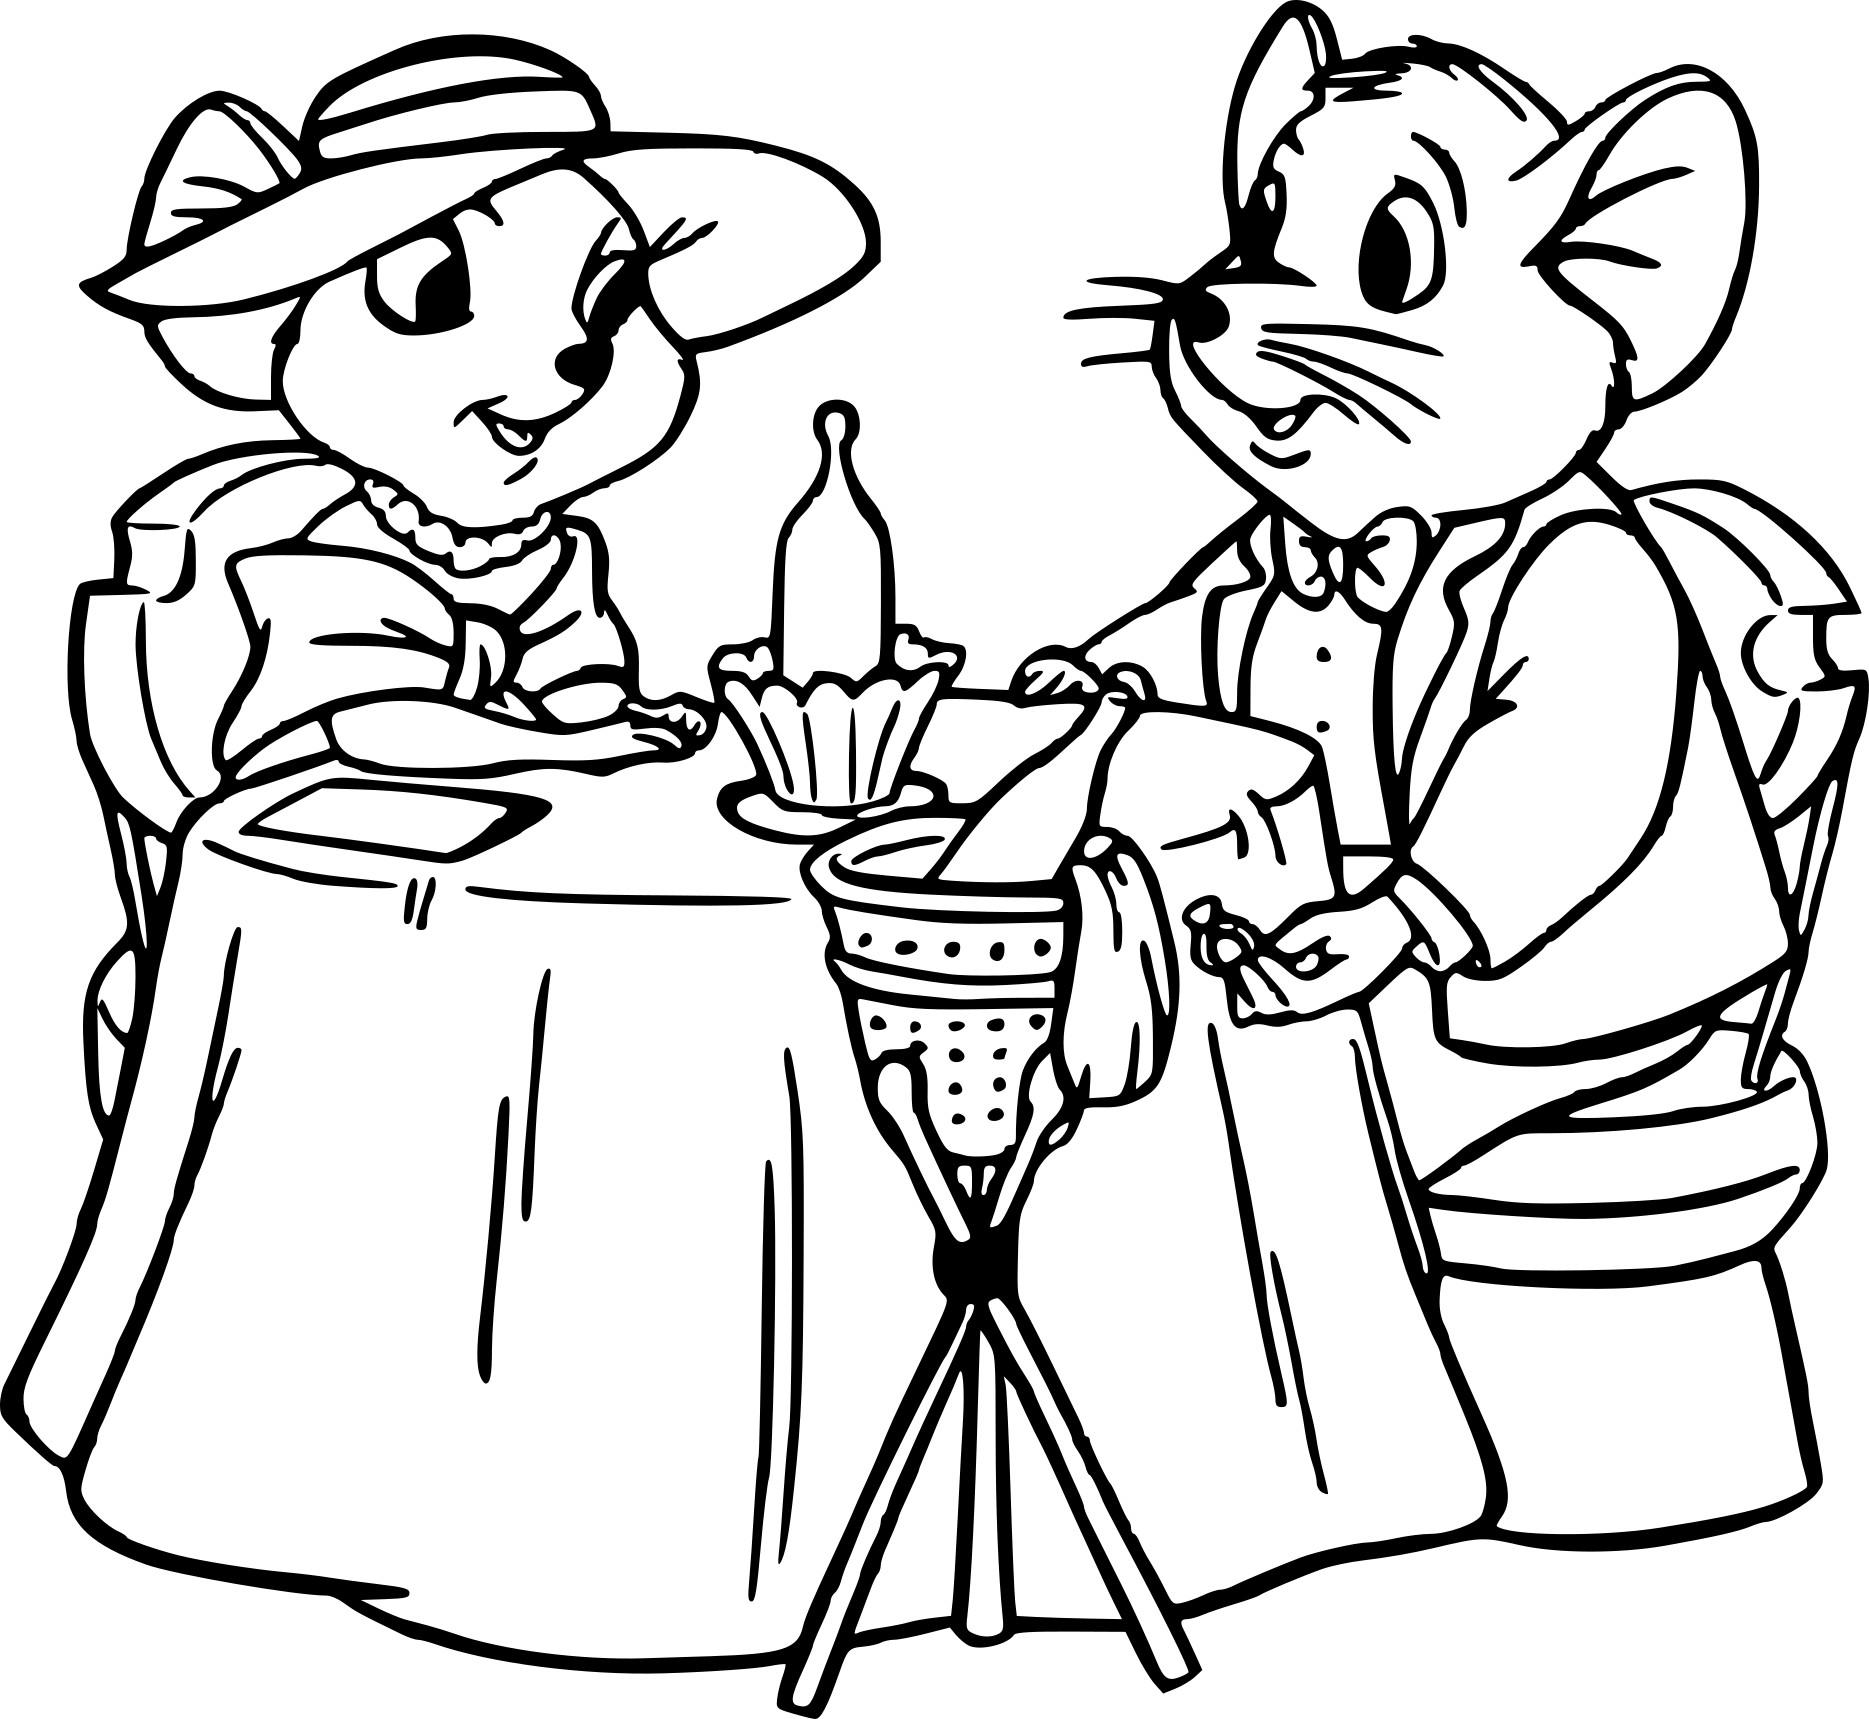 Coloriage Bernard et Bianca à imprimer